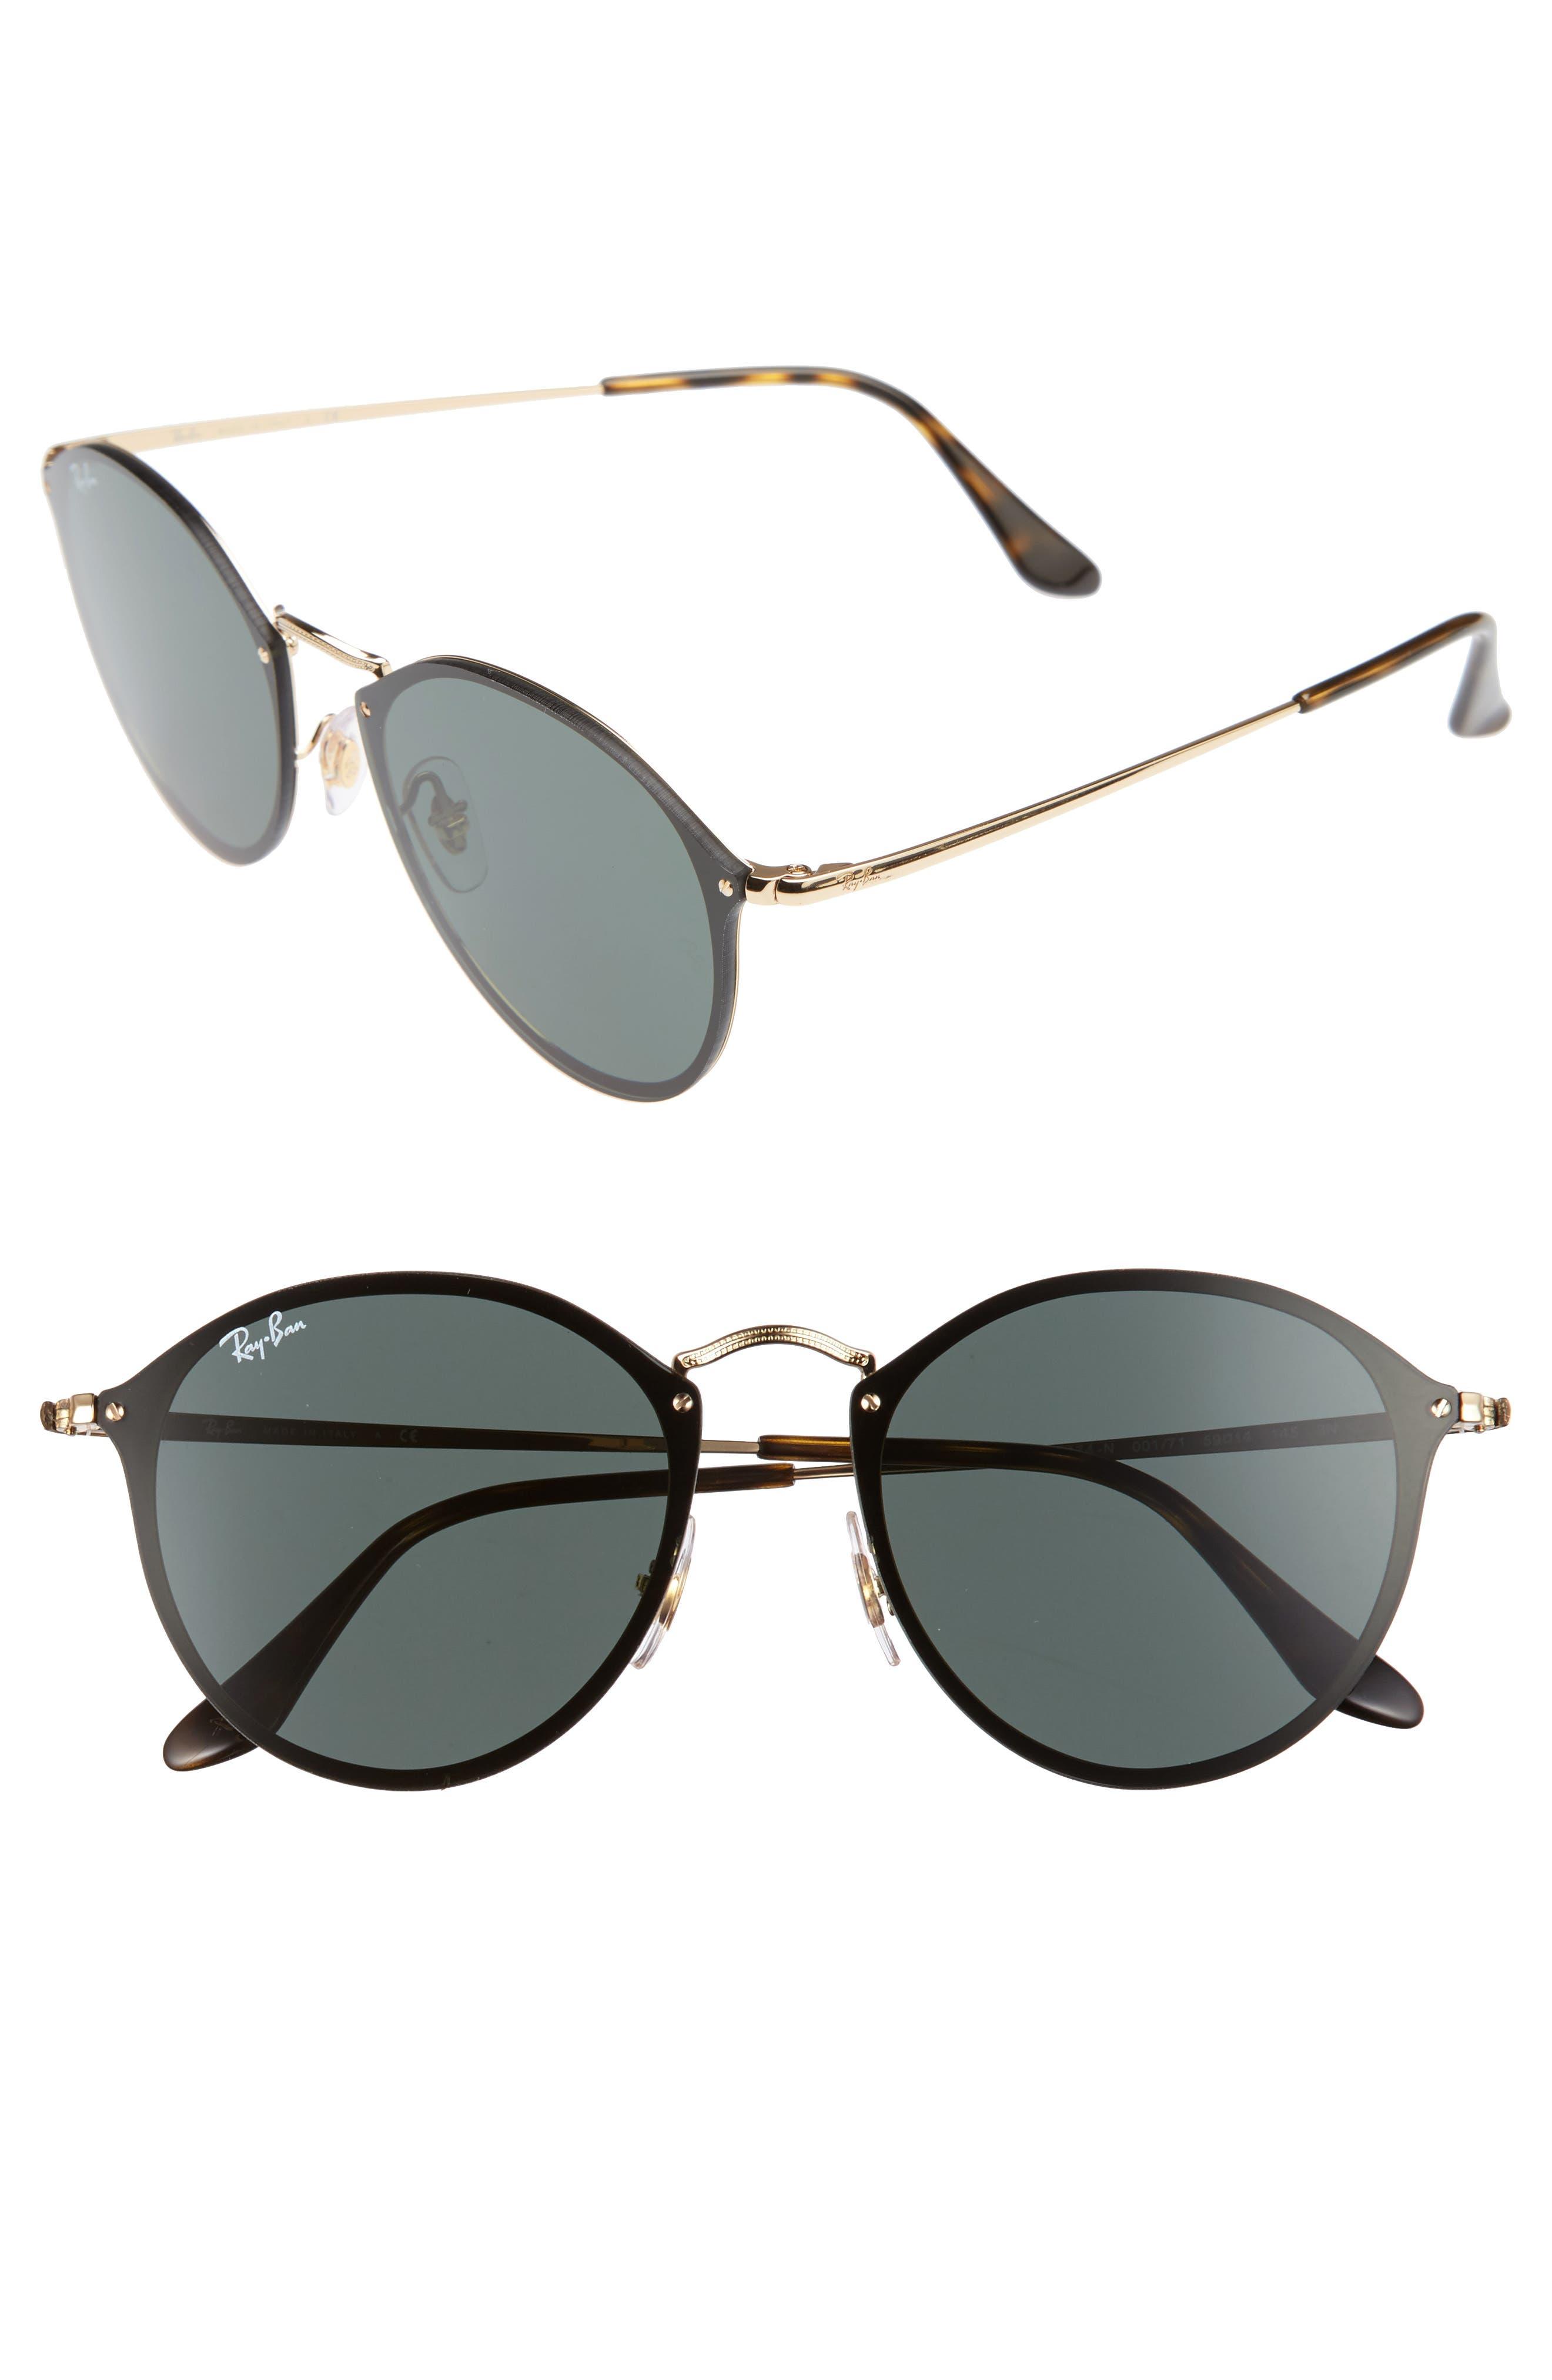 Ray-Ban Blaze 59mm Round Sunglasses